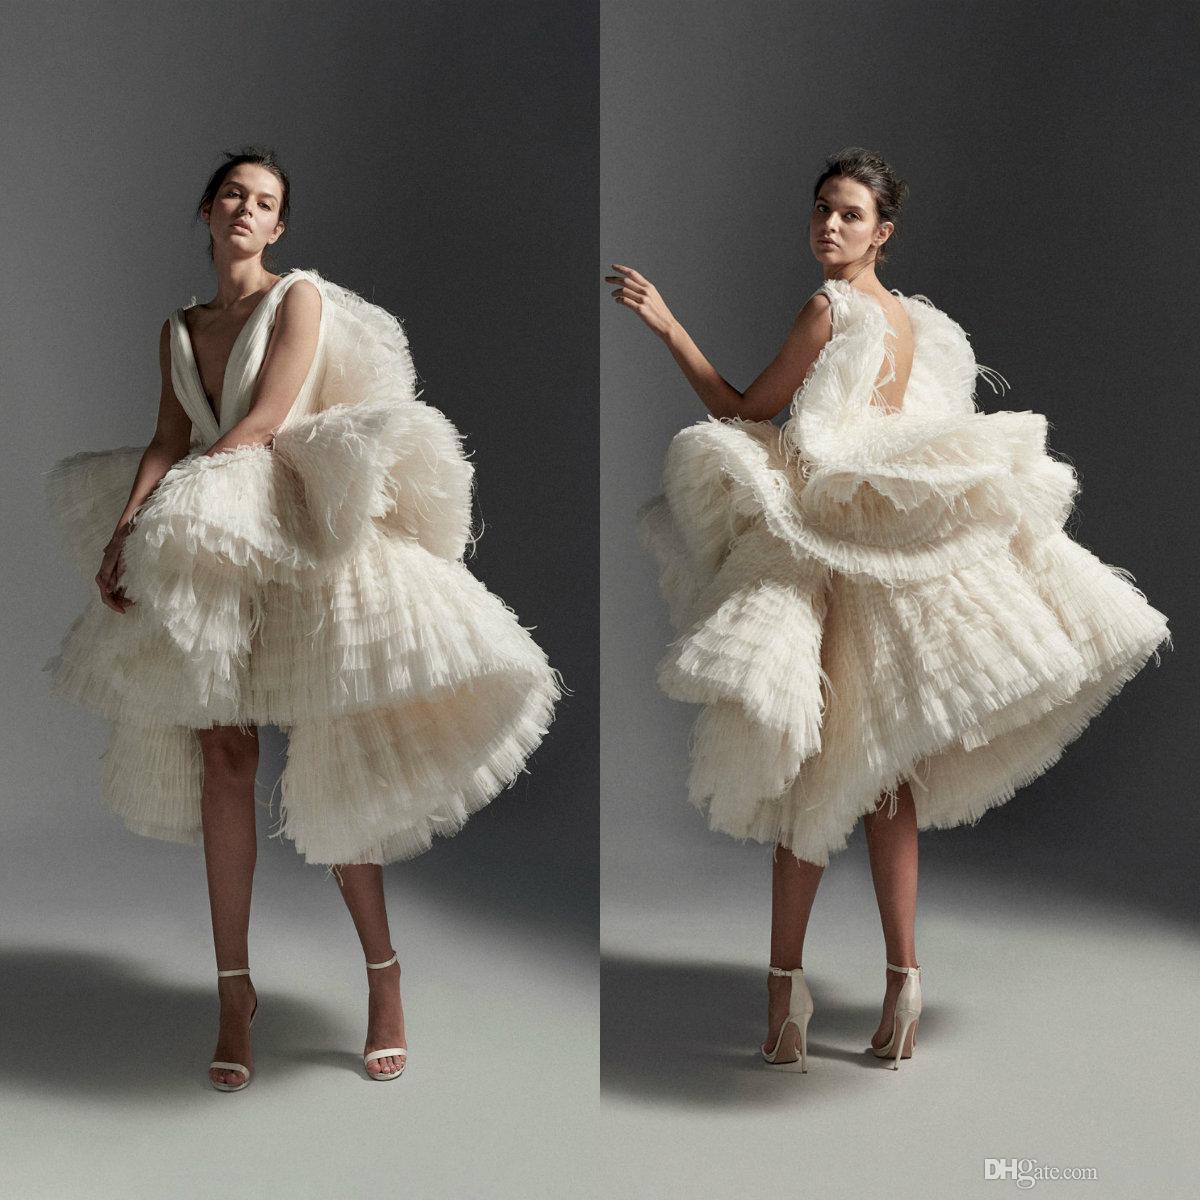 2020 Krikor Jabotian Wedding Dresses Short Deep V Neck Tulle Ruffles Tiered Skirts High Low Wedding Dress Custom Feather Abiti Da Sposa